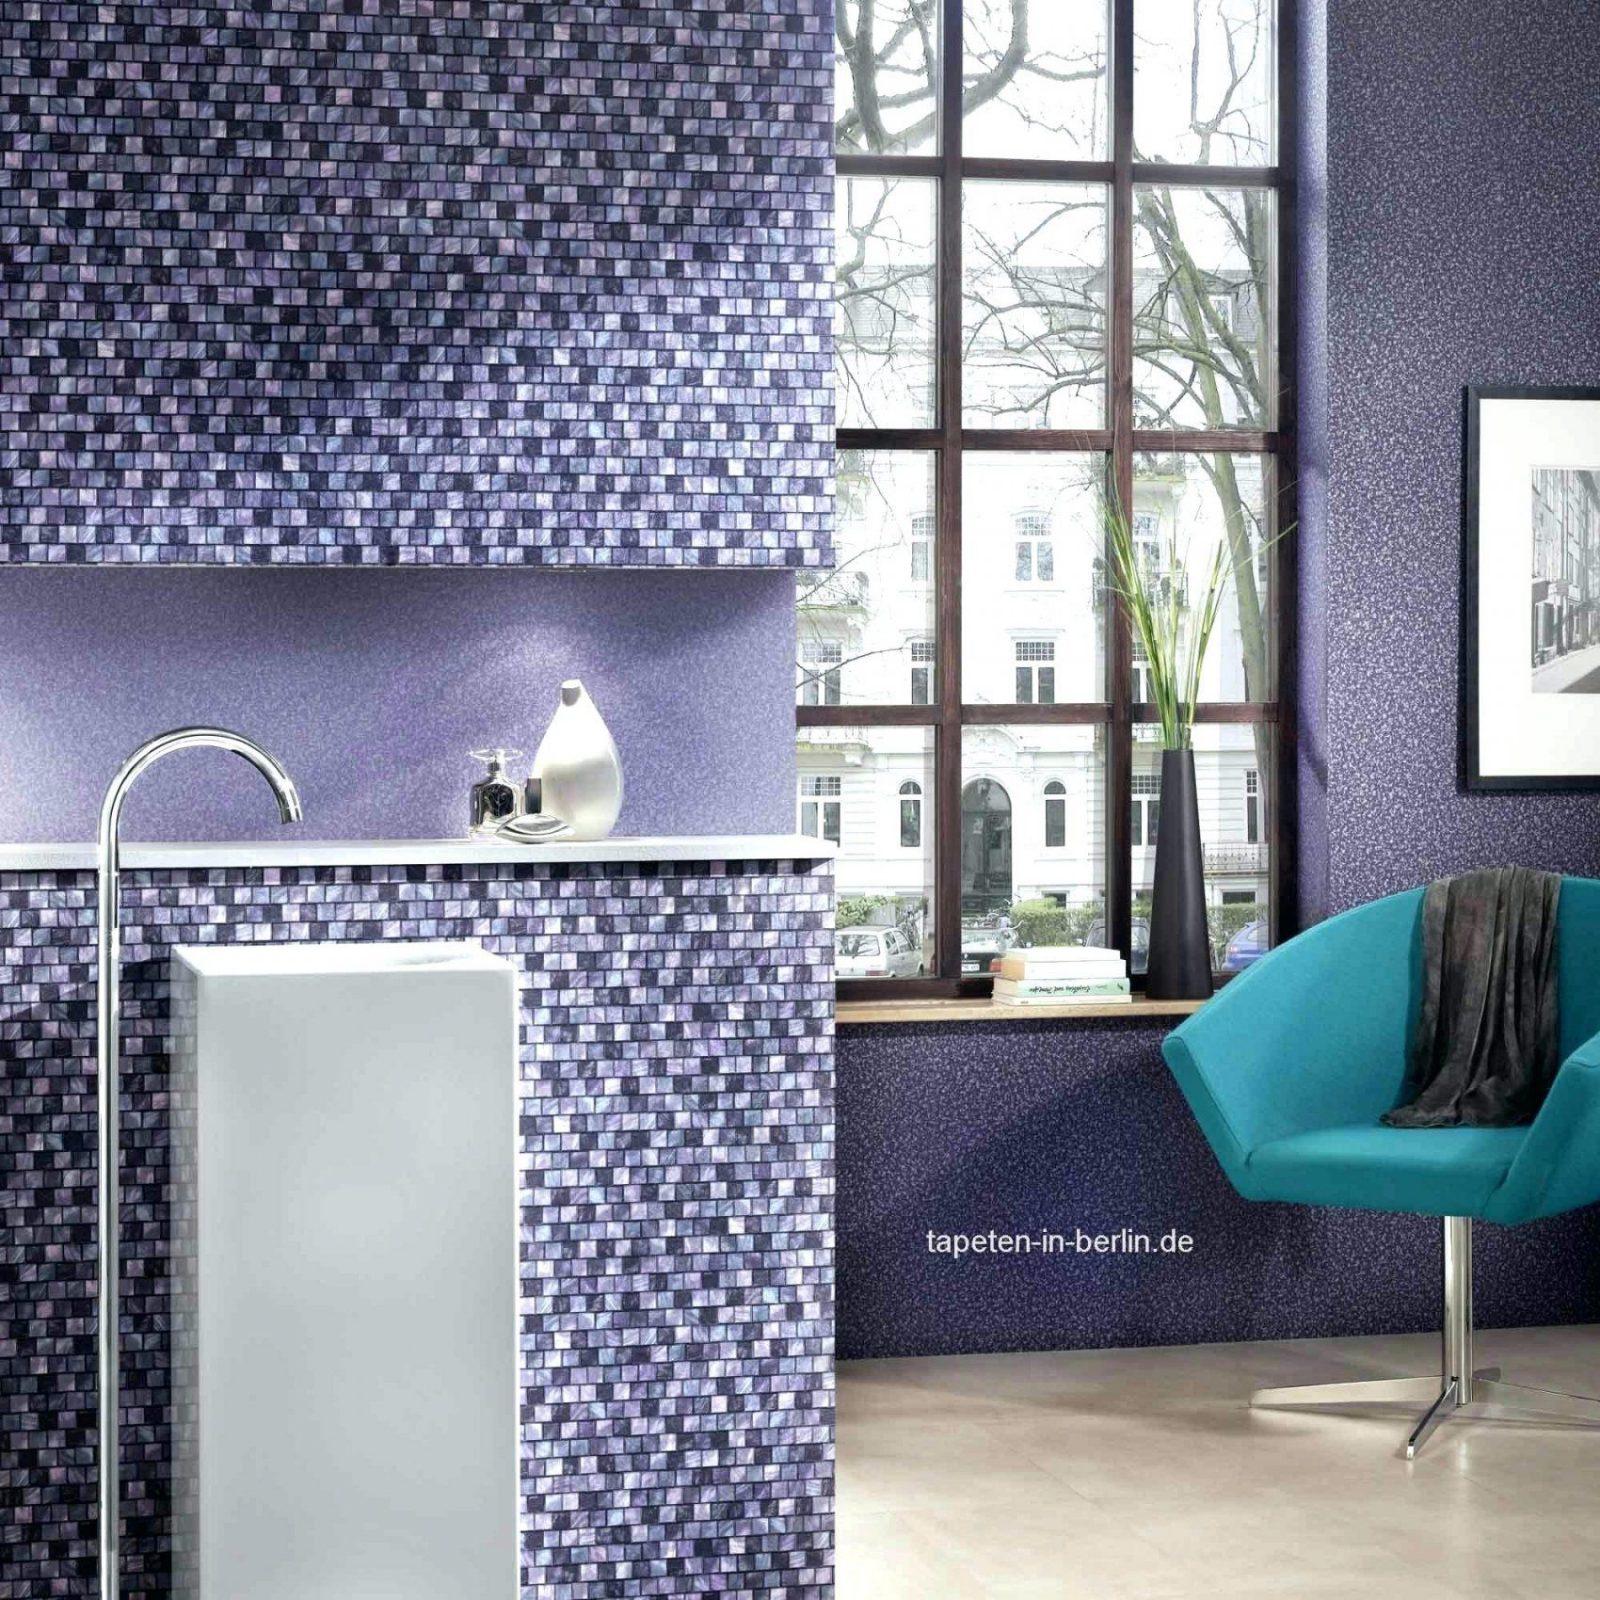 Tapeten lila farbe wandgestaltung haus design ideen for Tapeten in lila